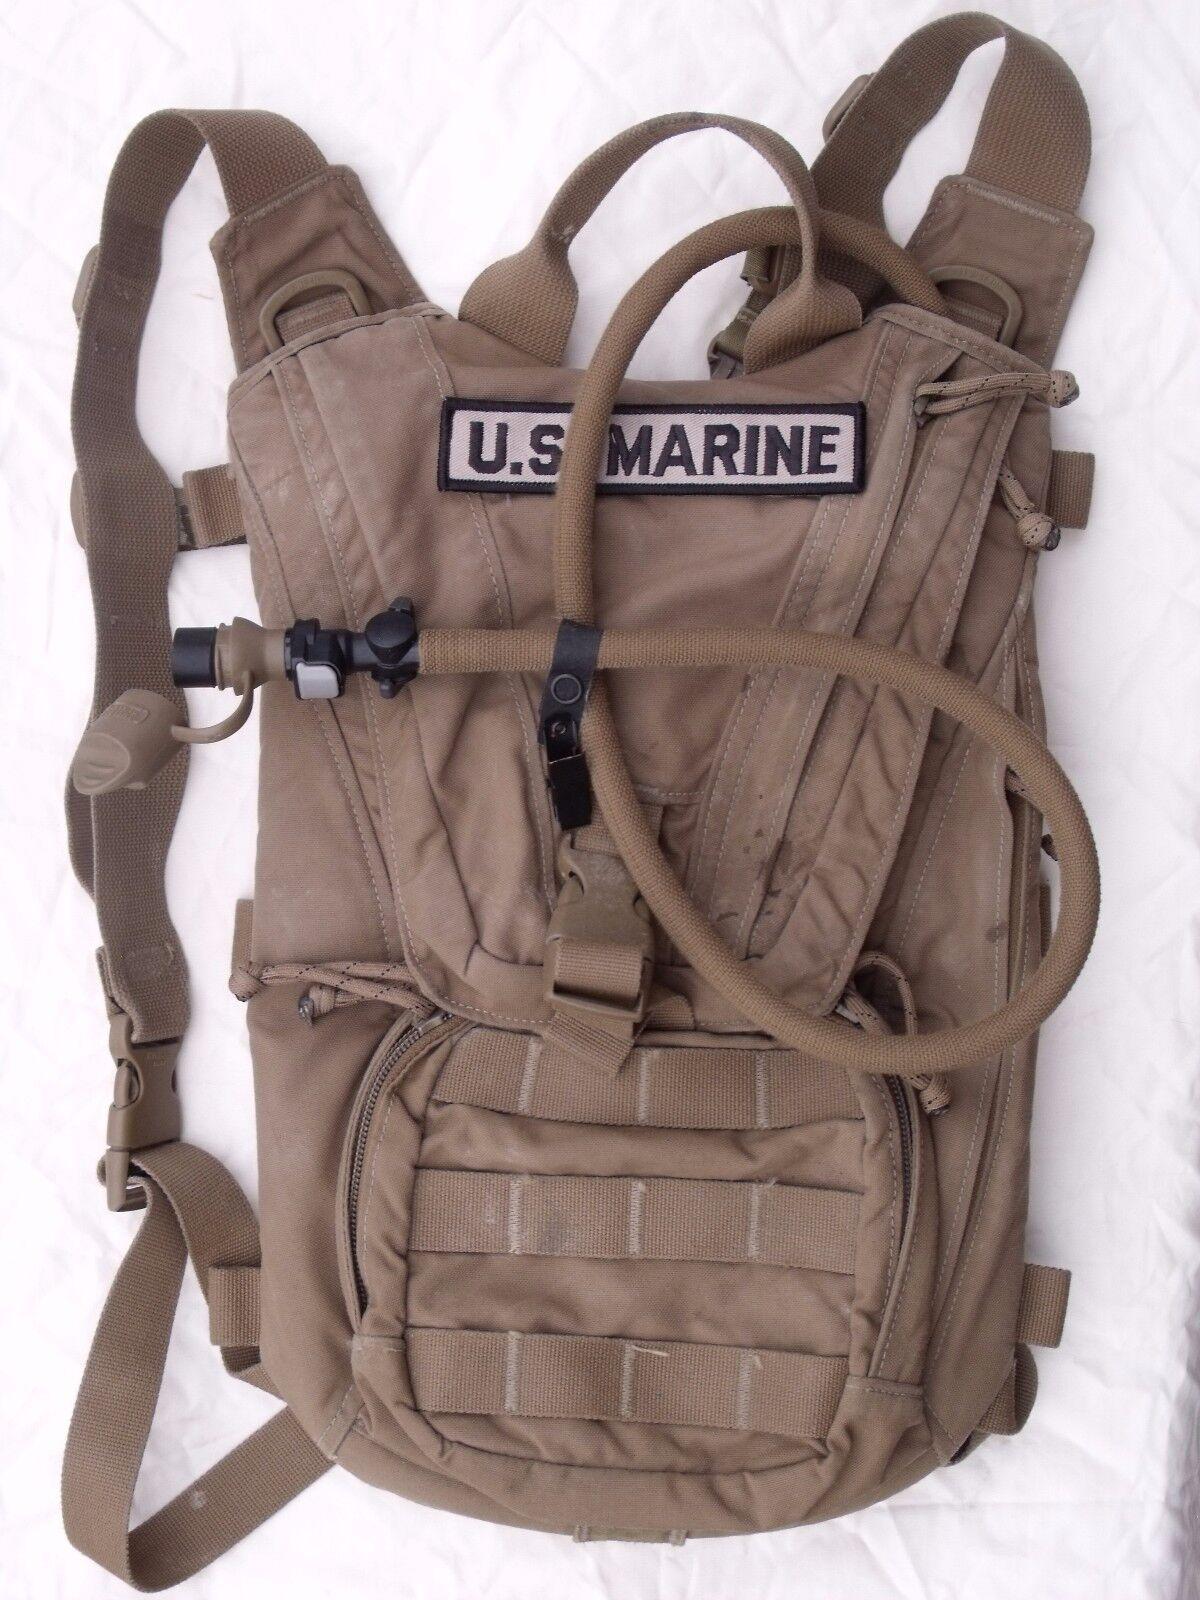 USMC FILBE Hydration System Carrier 3 L 100 oz  Bladder  Coyote Marine Camelbak  at cheap